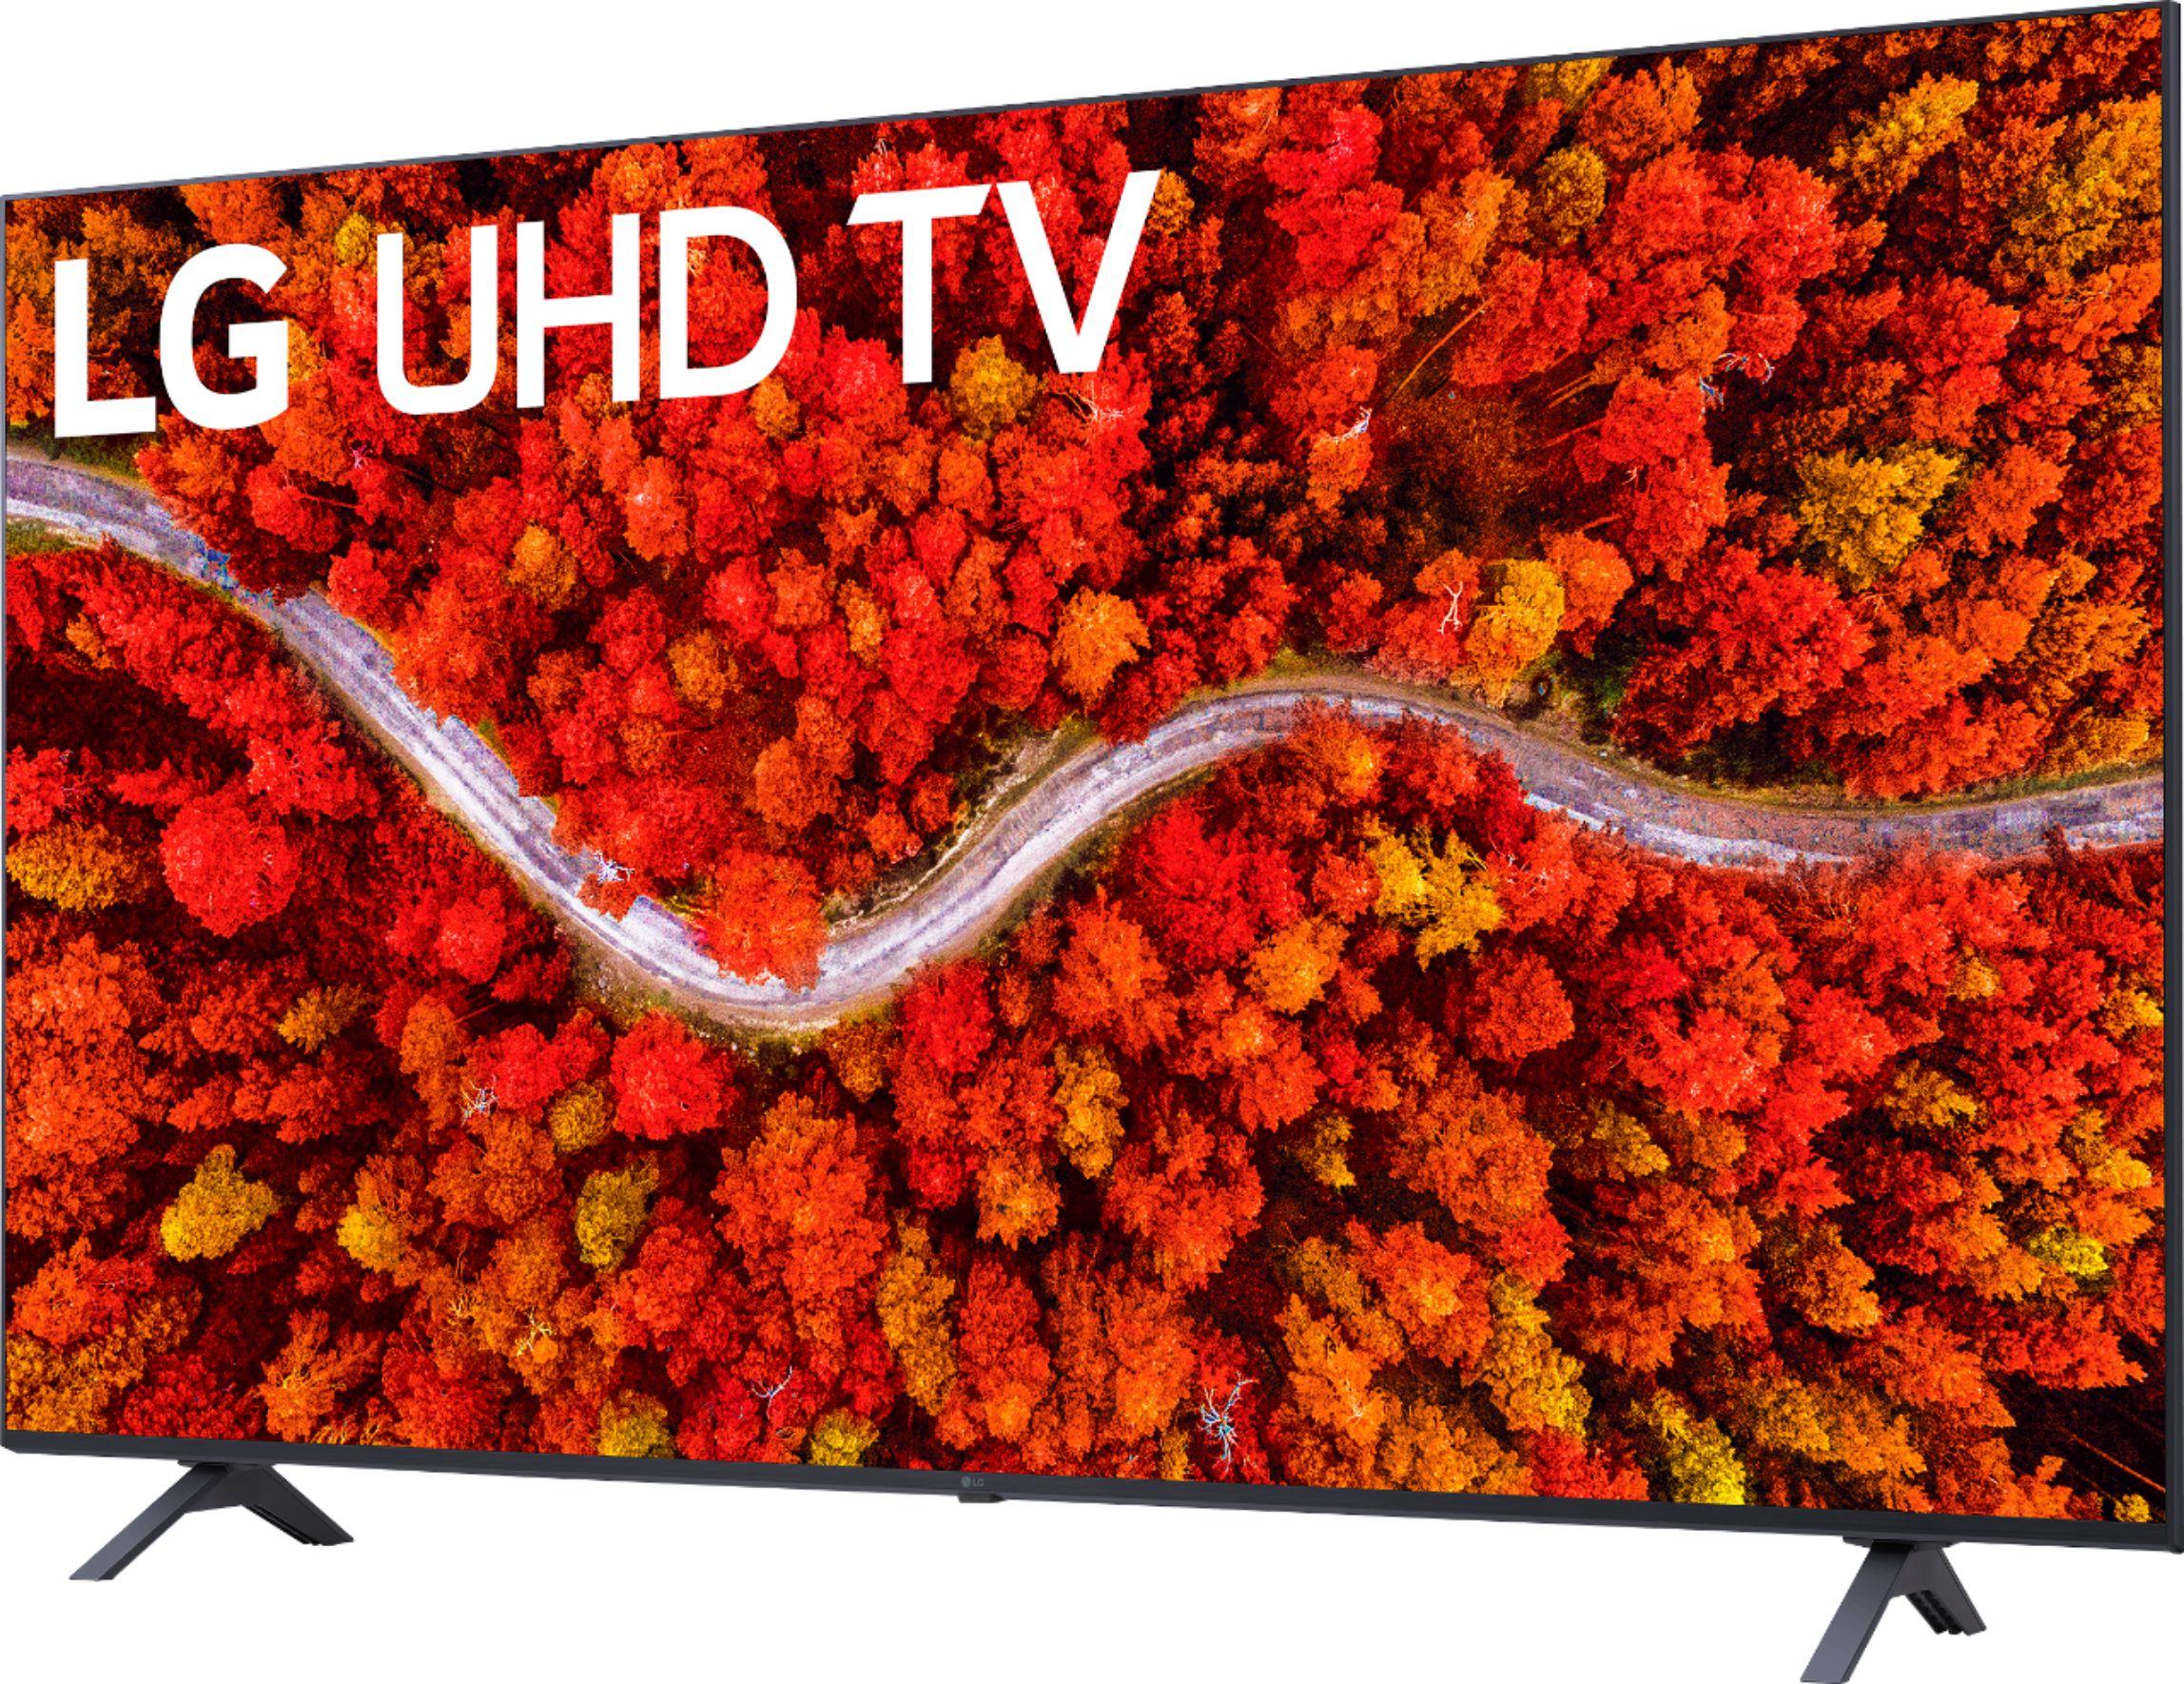 "50"" Class UP8000 Series LED 4K UHD Smart webOS TV"